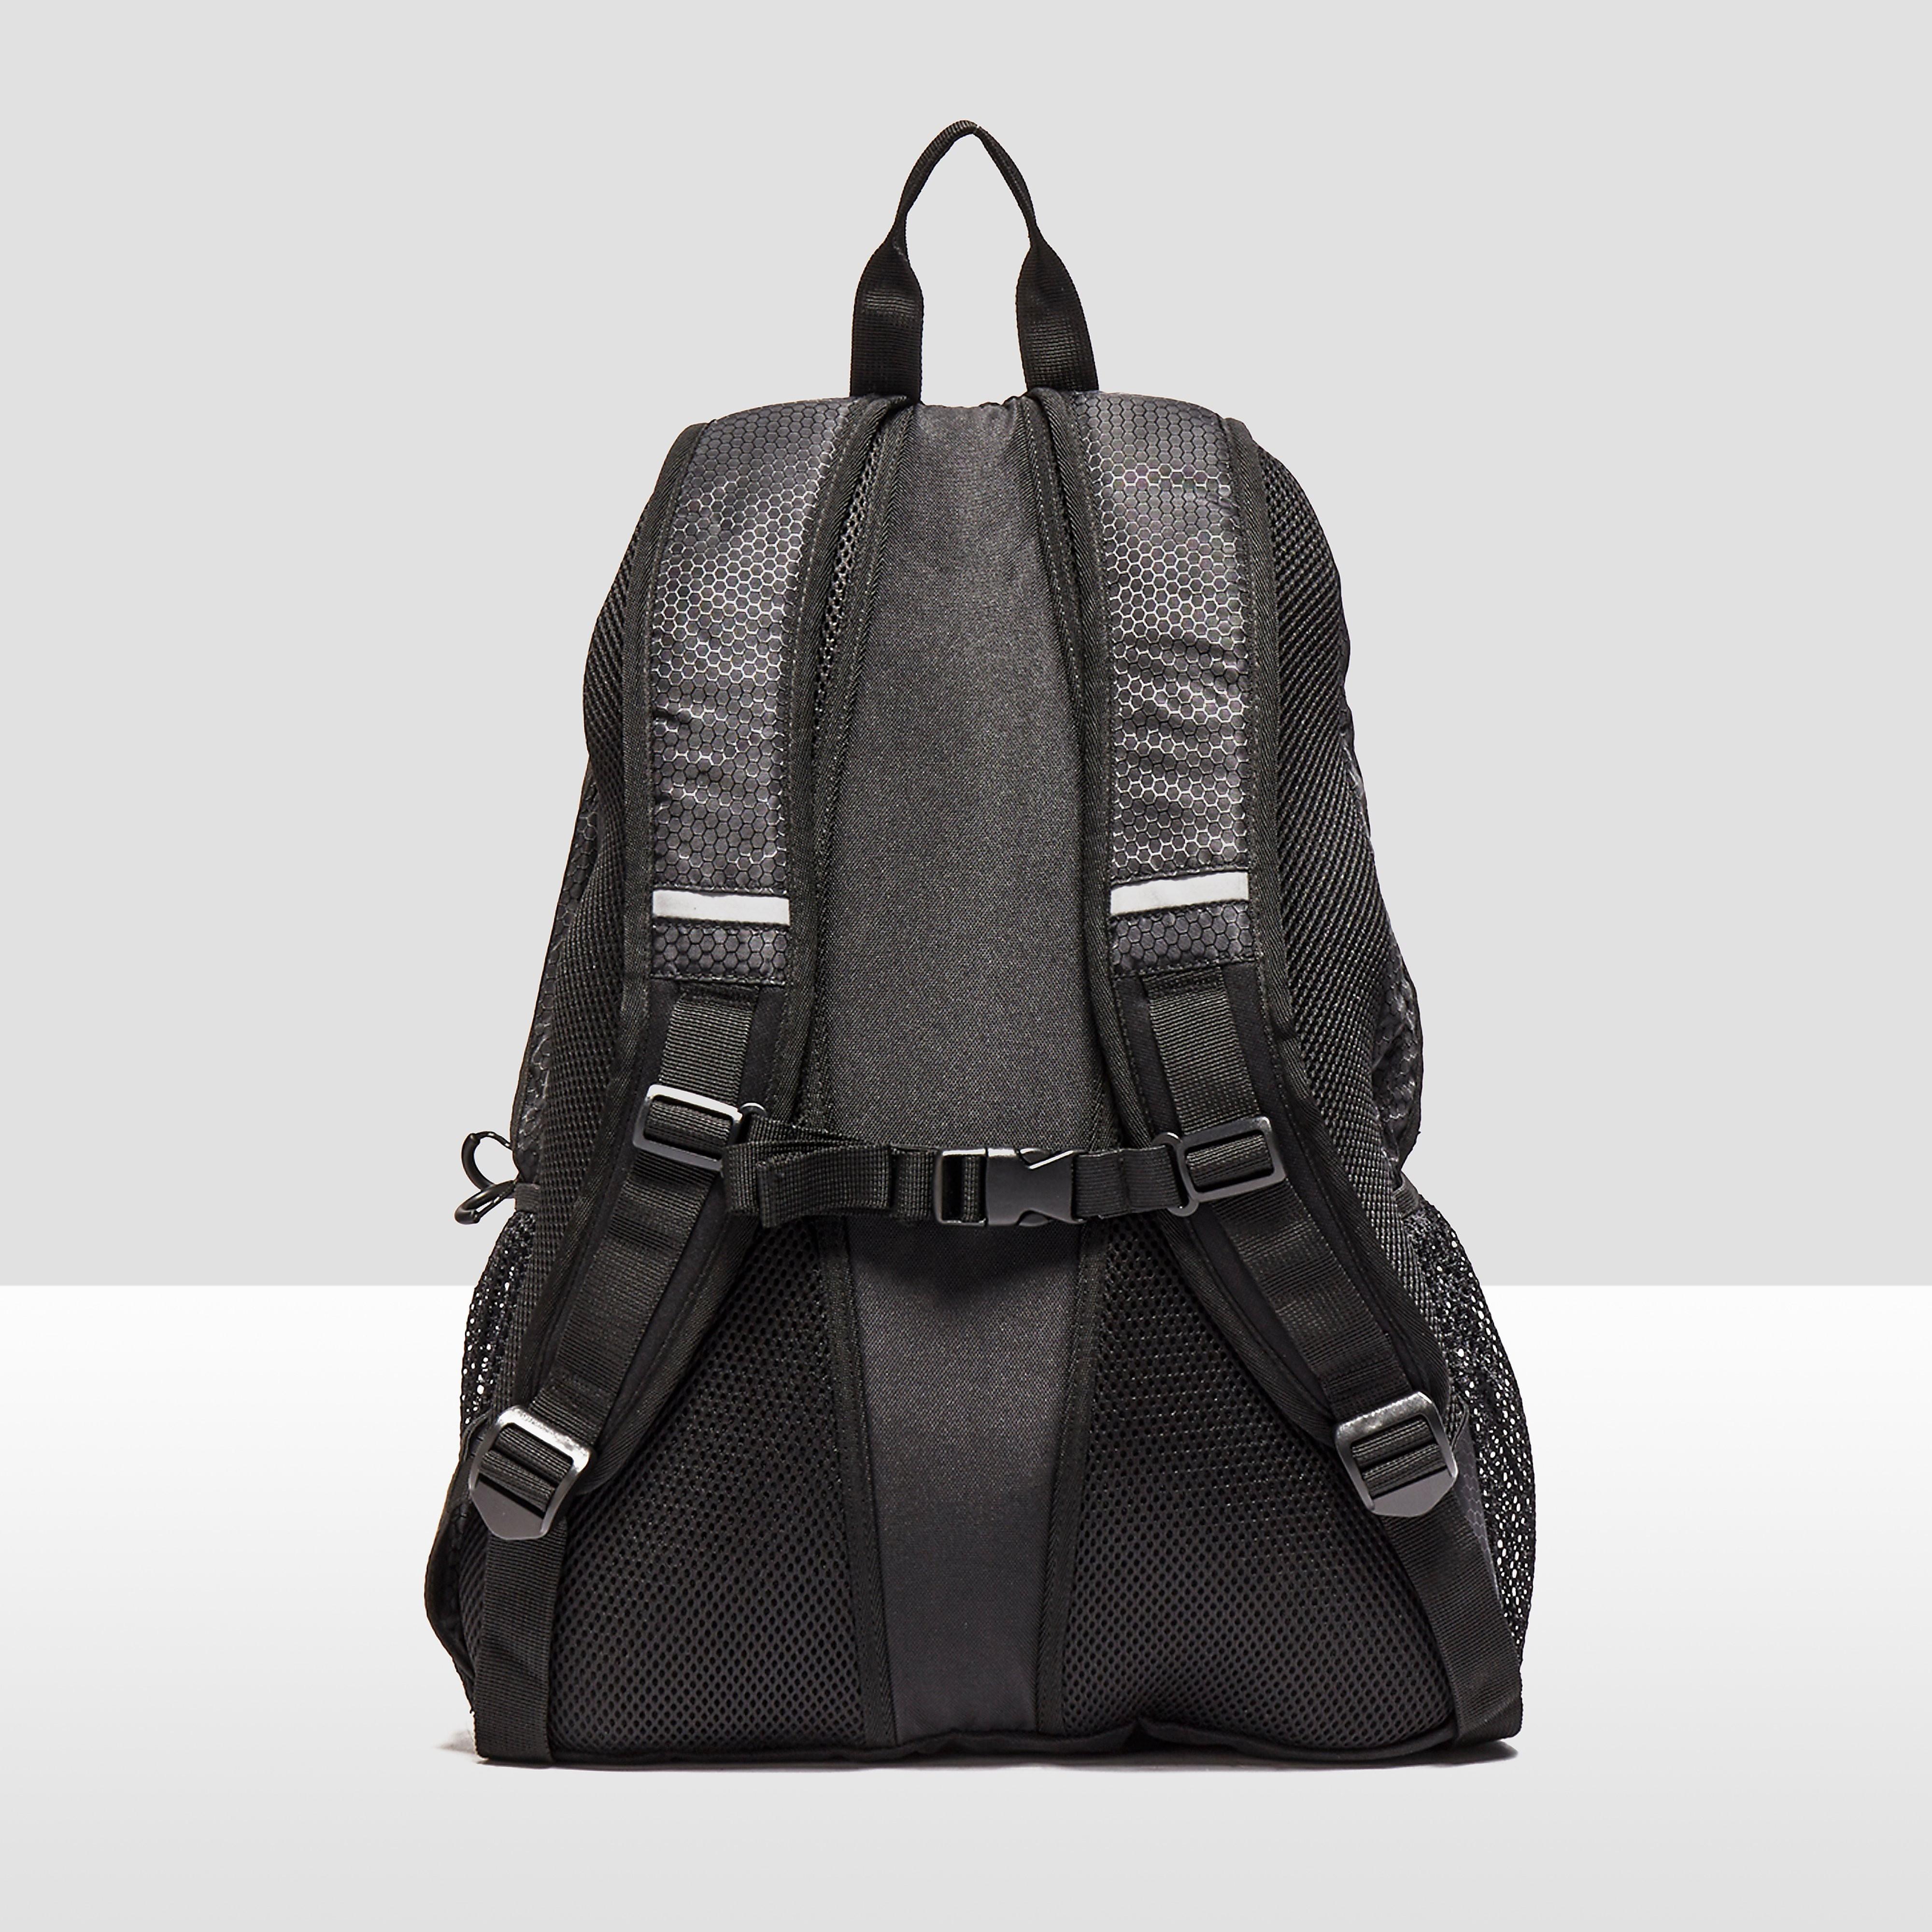 Yonex Badminton Backpack